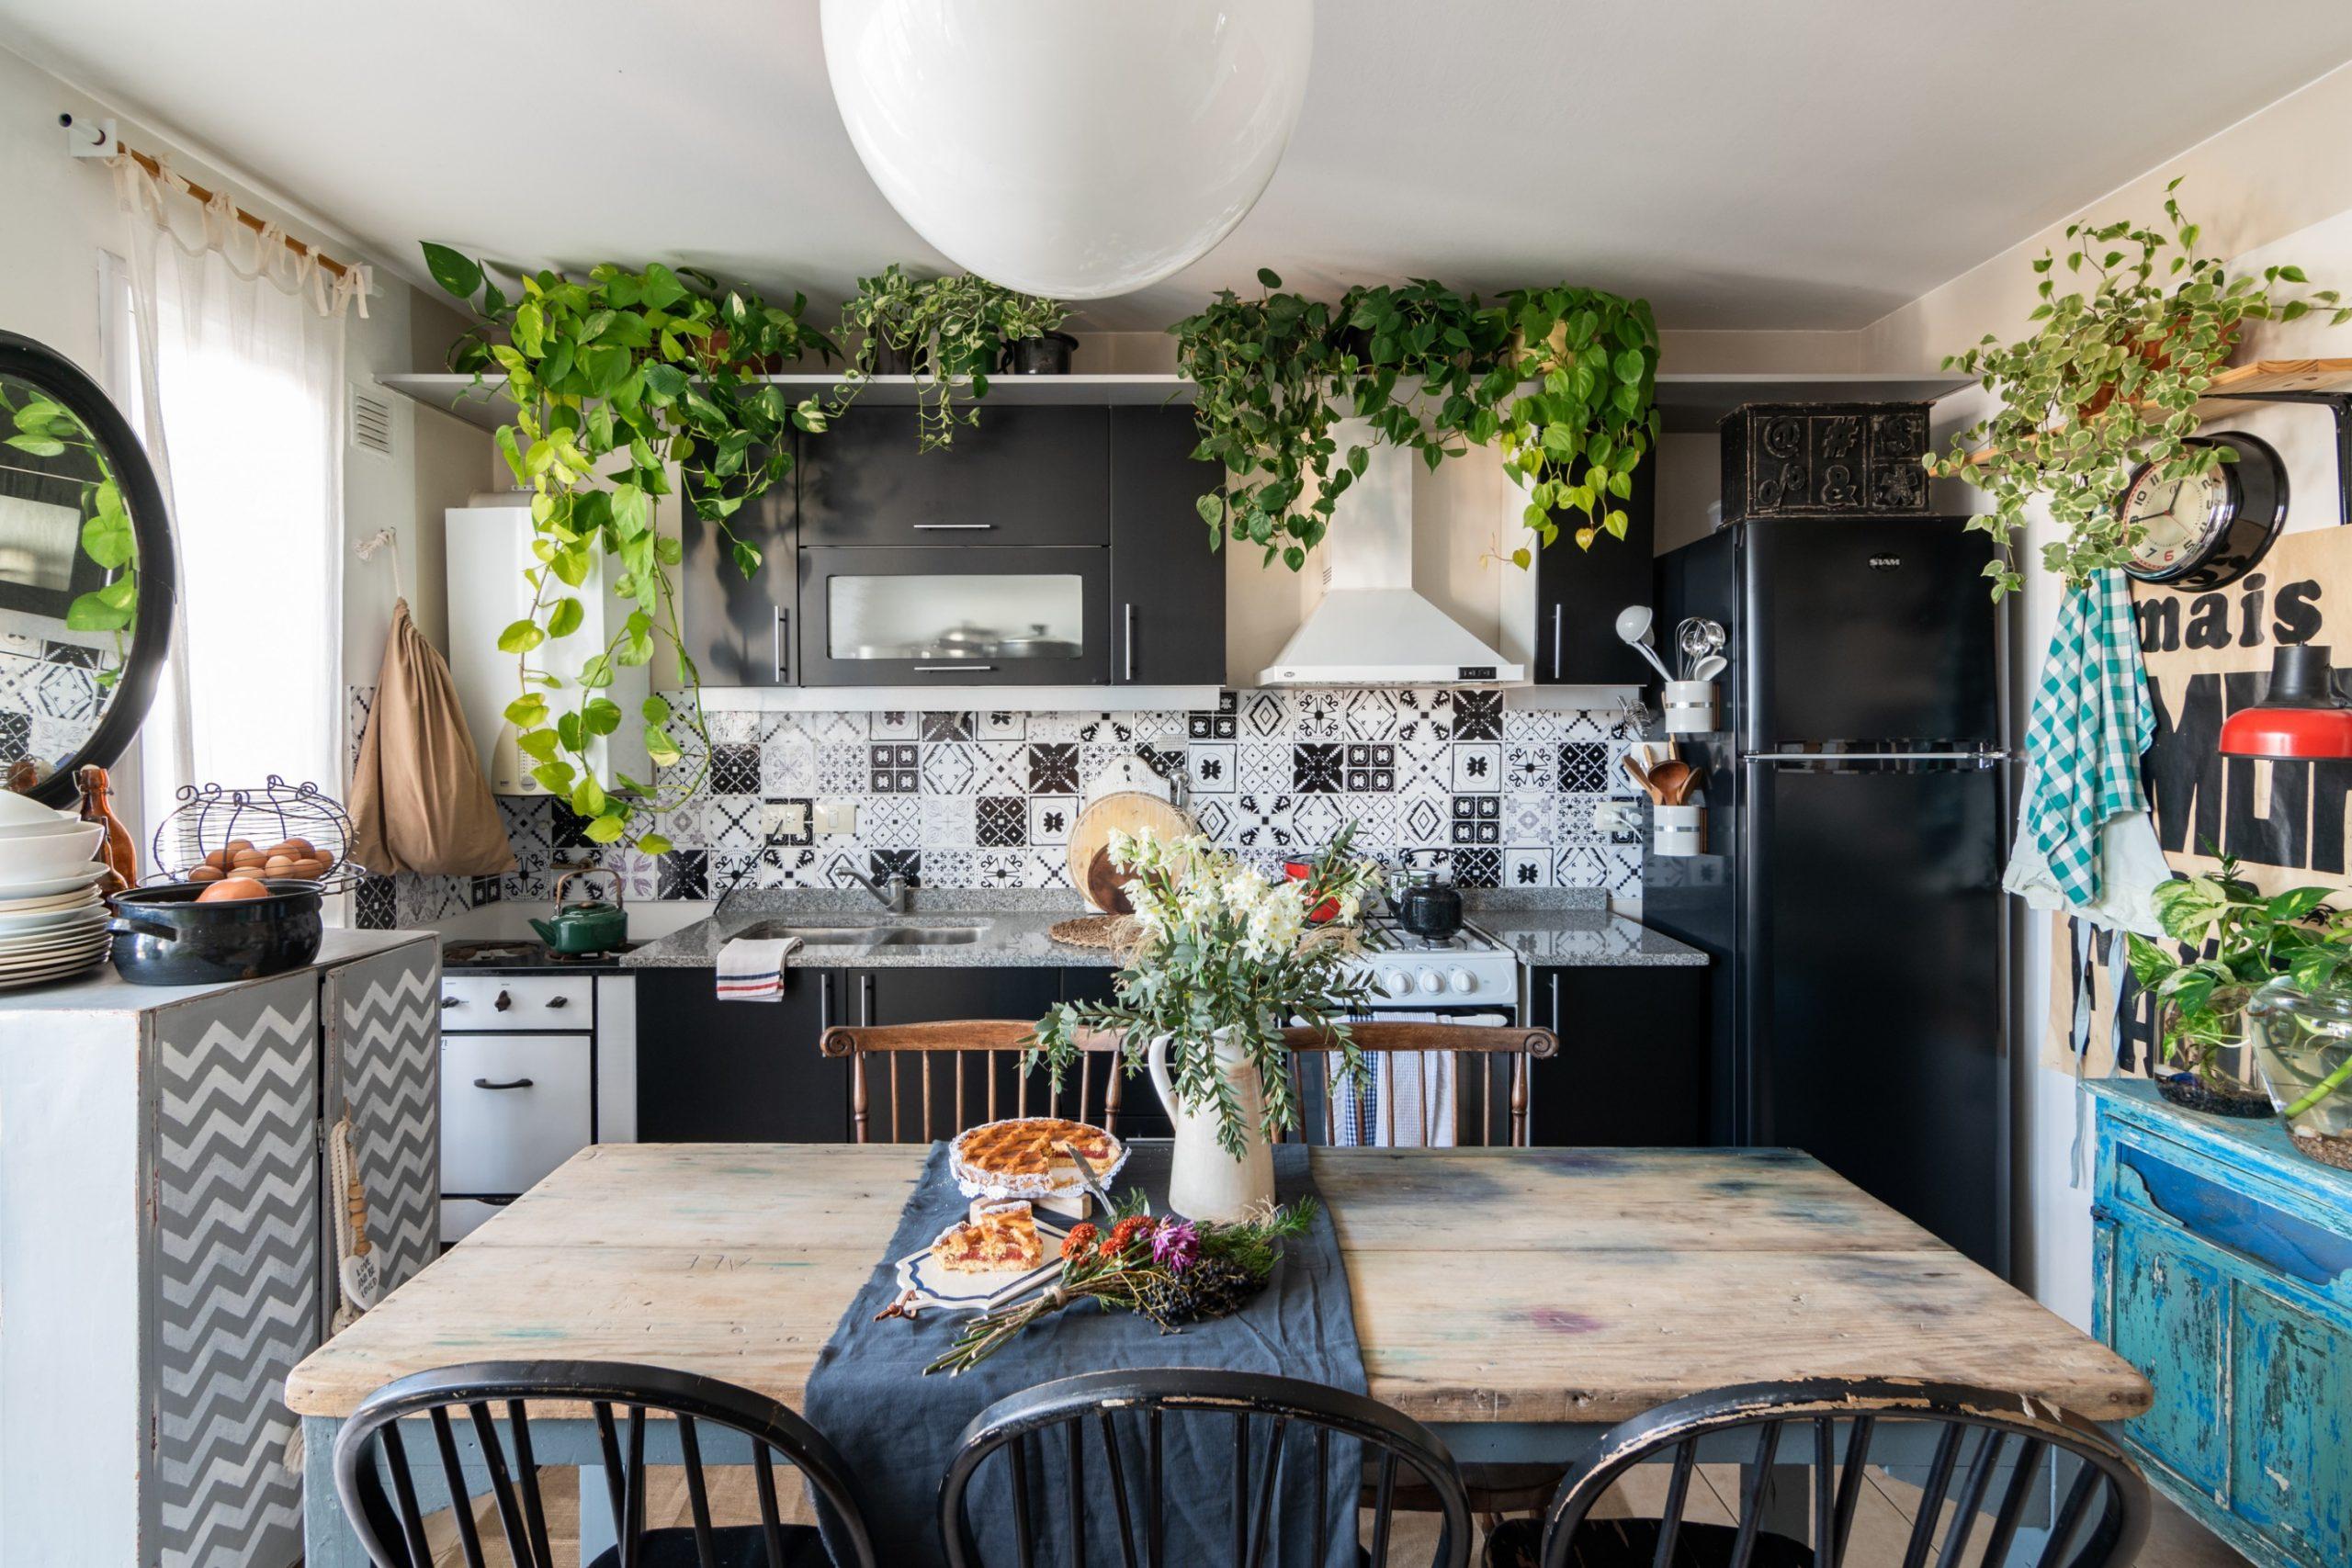 Bohemian Small Space Design Trend - Boho Decorating  Apartment  - Small Apartment Decorating Ideas Boho